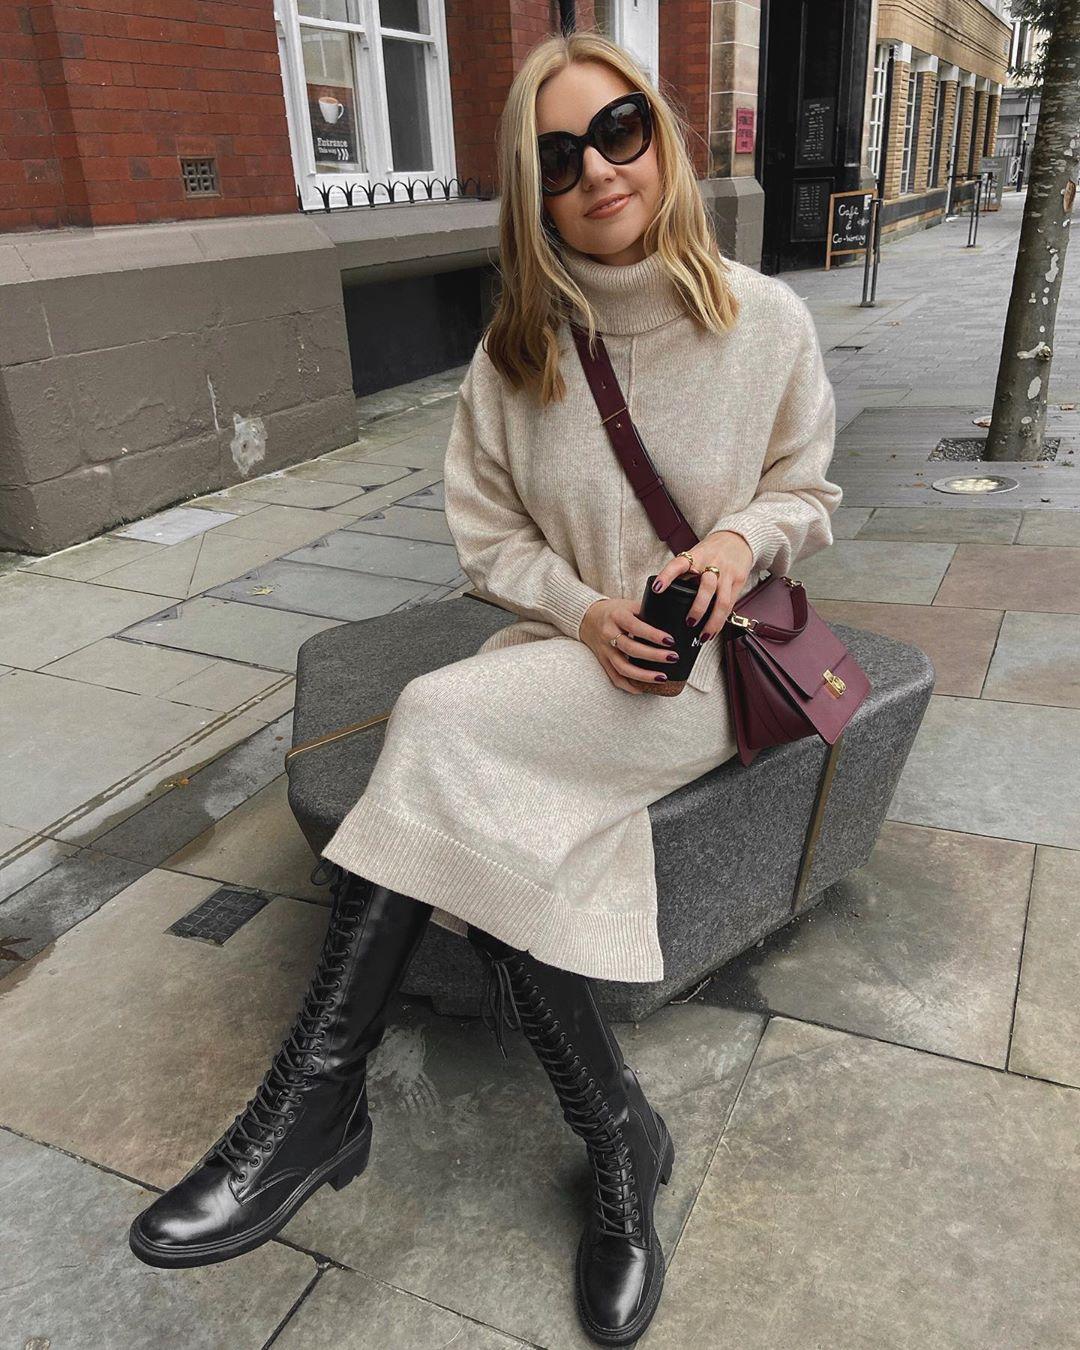 lace-up flat boots de Zara sur lydiajanetomlinson